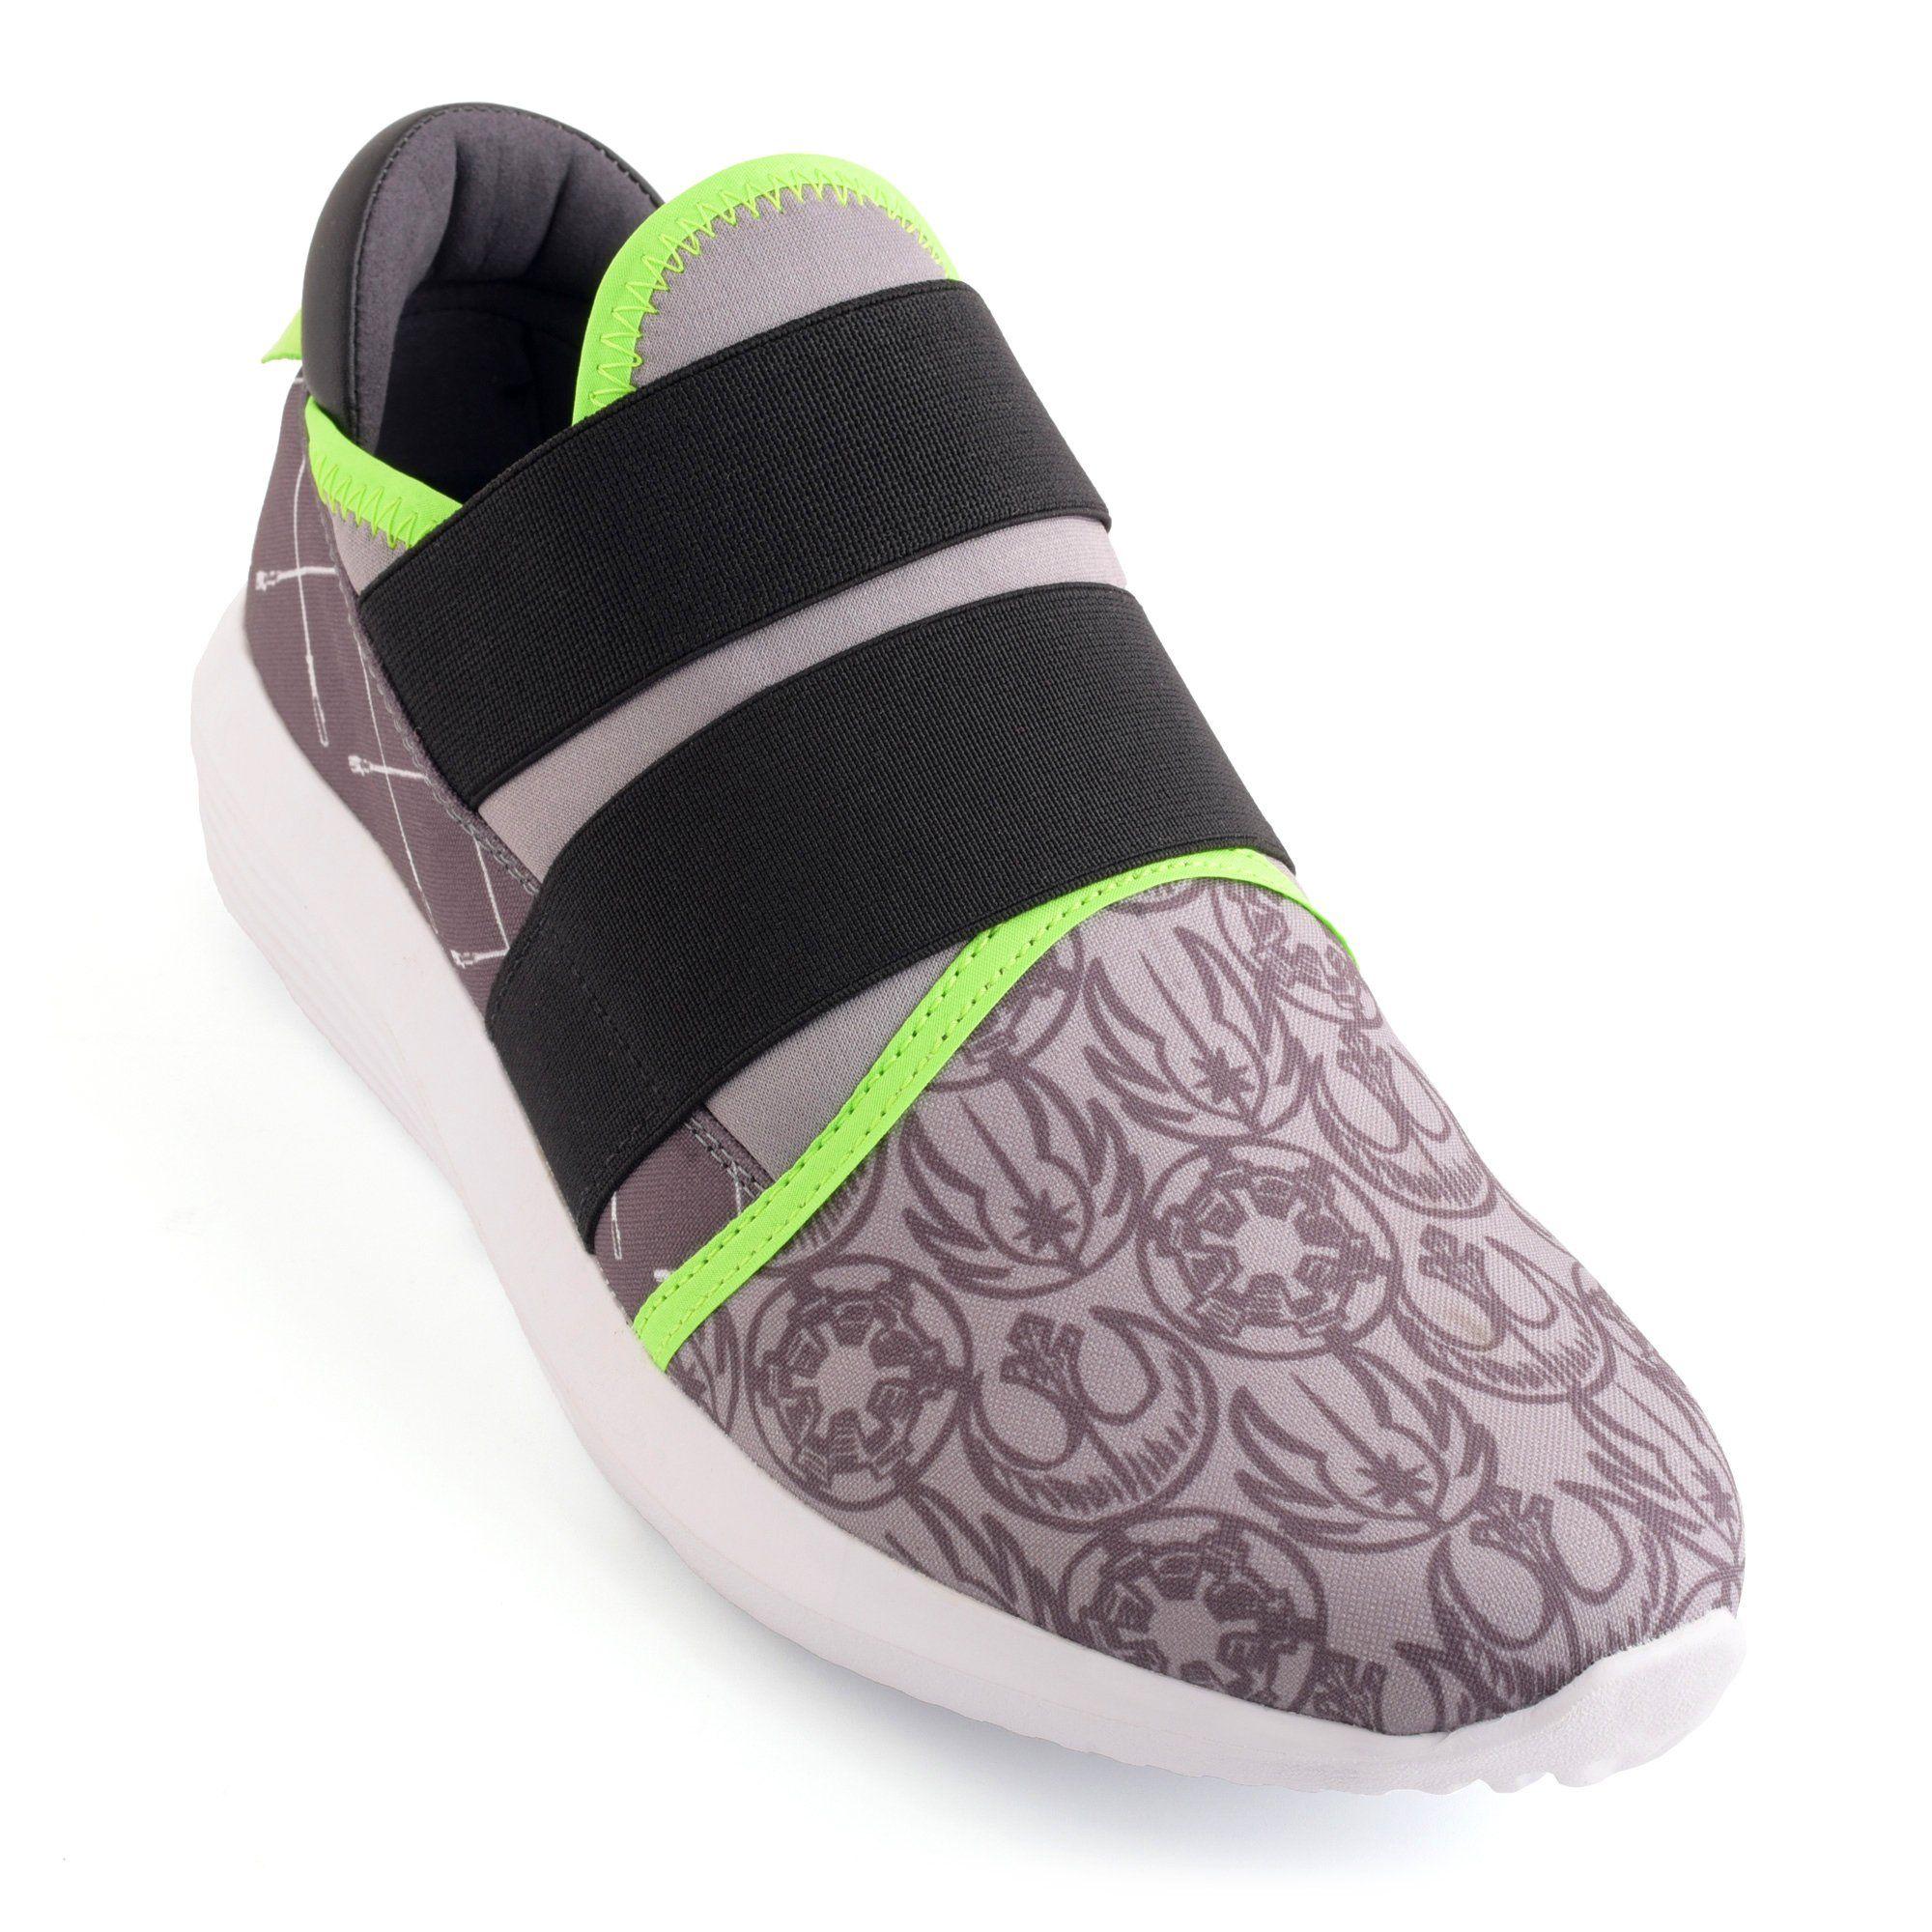 6b307a58e6 Inkkas Worldwear Launches a Star Wars Themed Footwear Collection ...